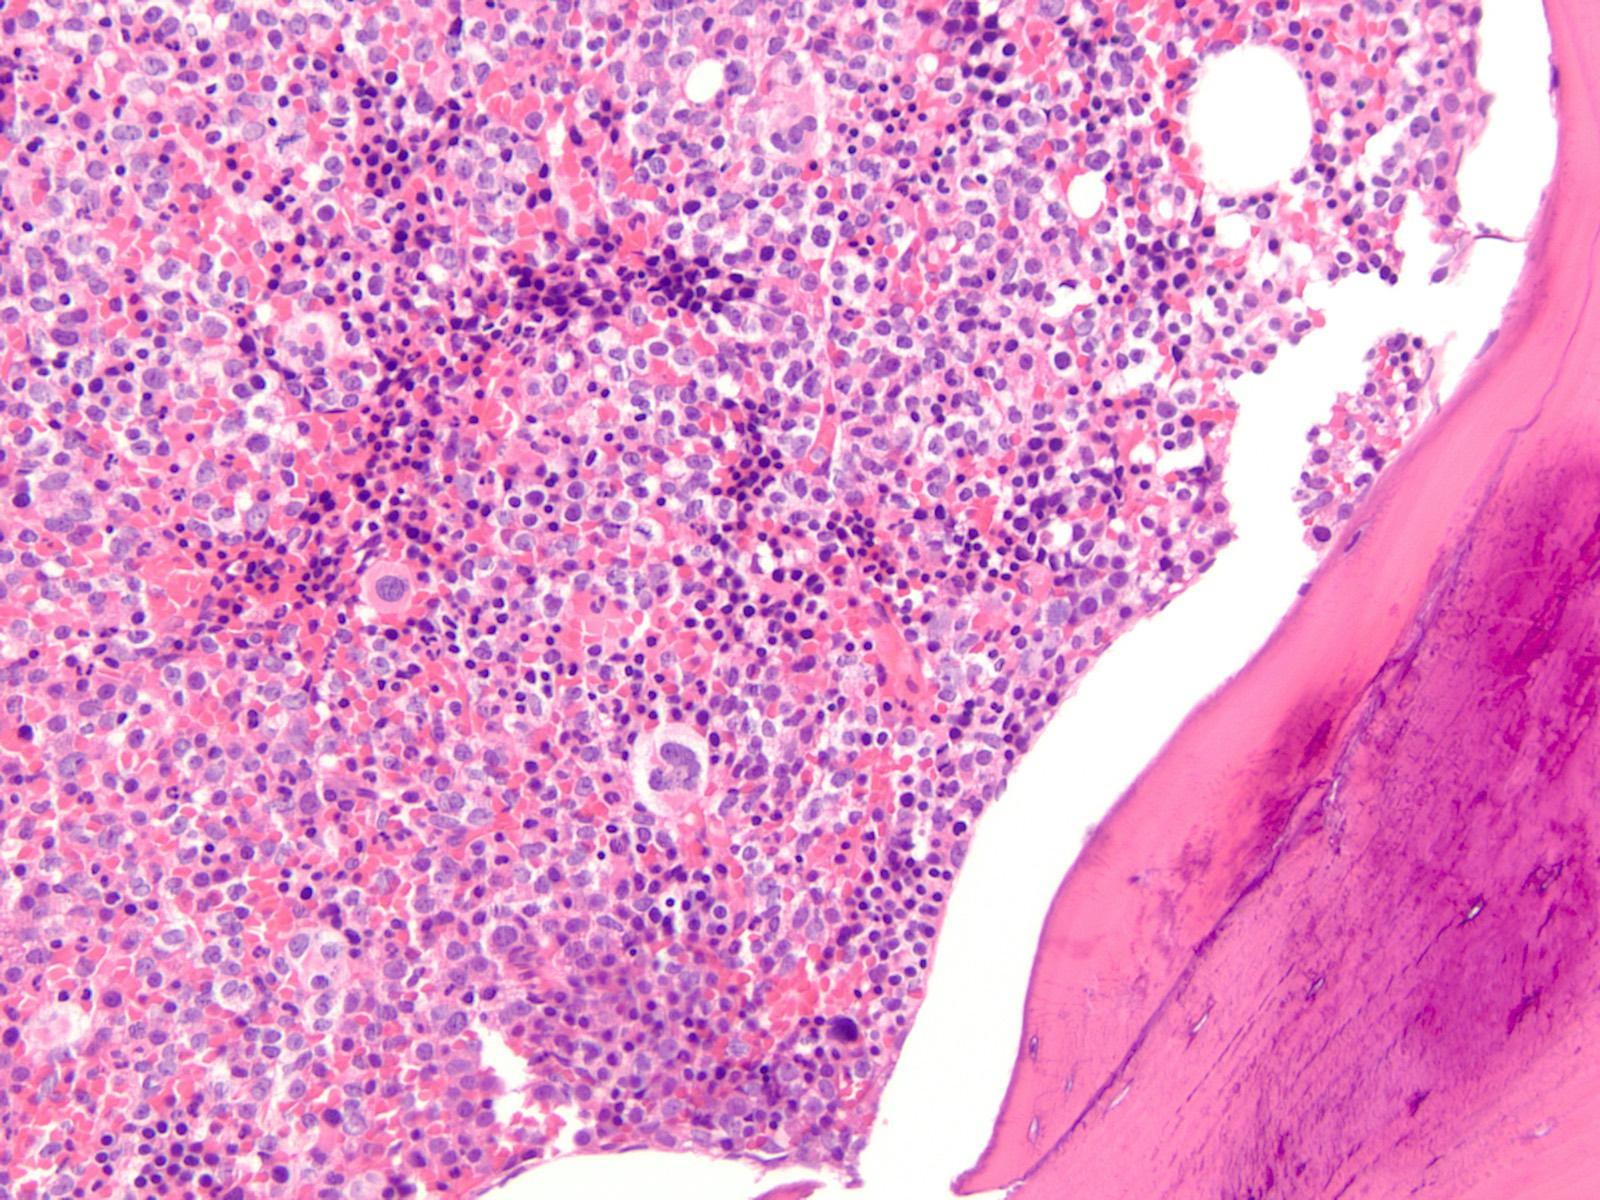 Bone marrow core biopsy